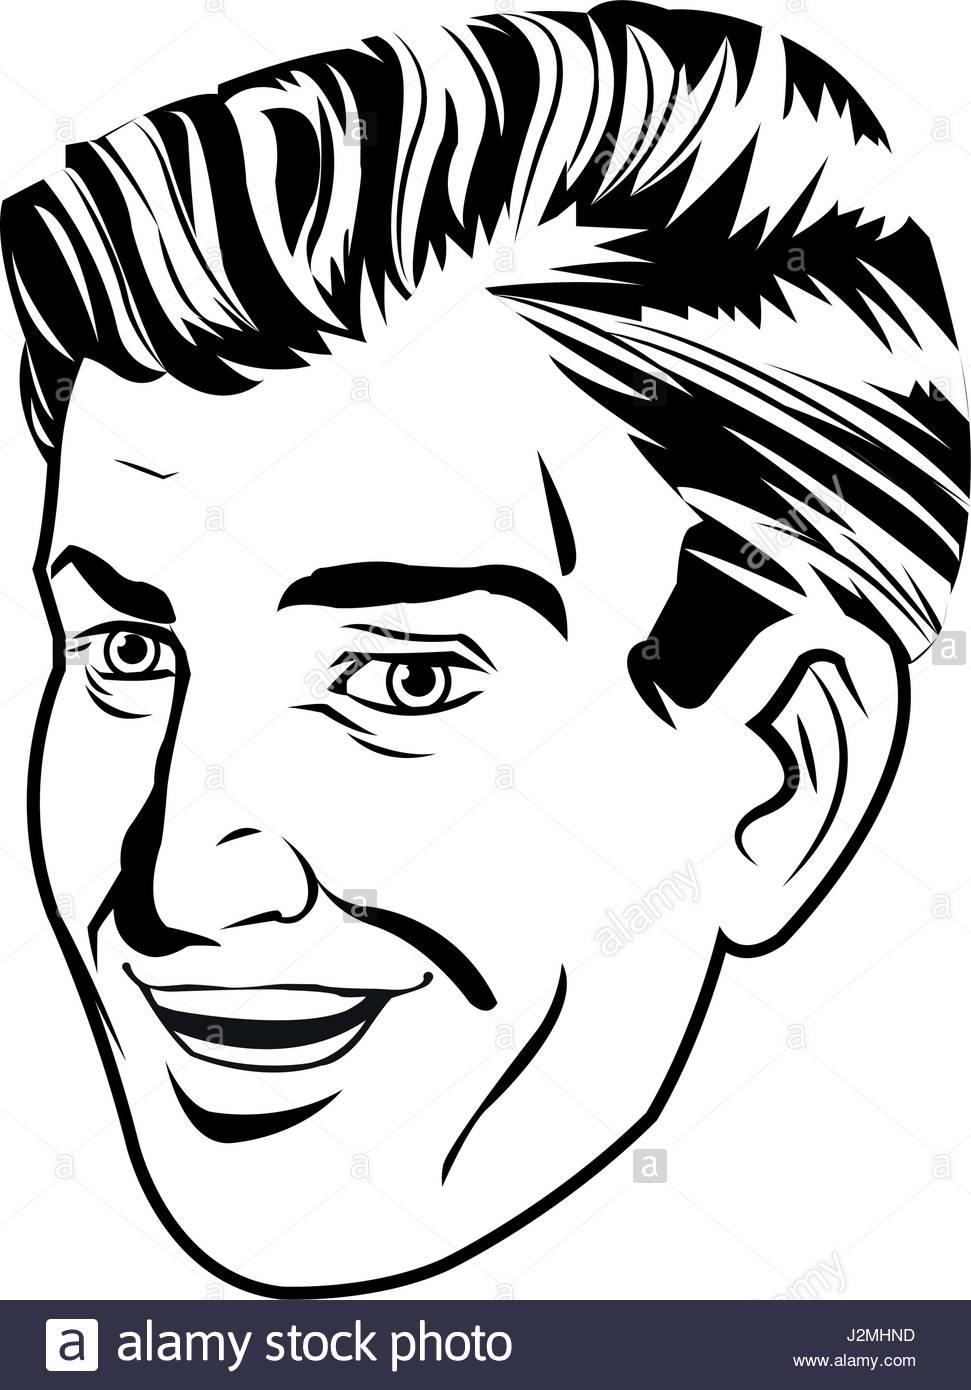 971x1390 Face Man Smiling Expression Pop Art Design Stock Vector Art